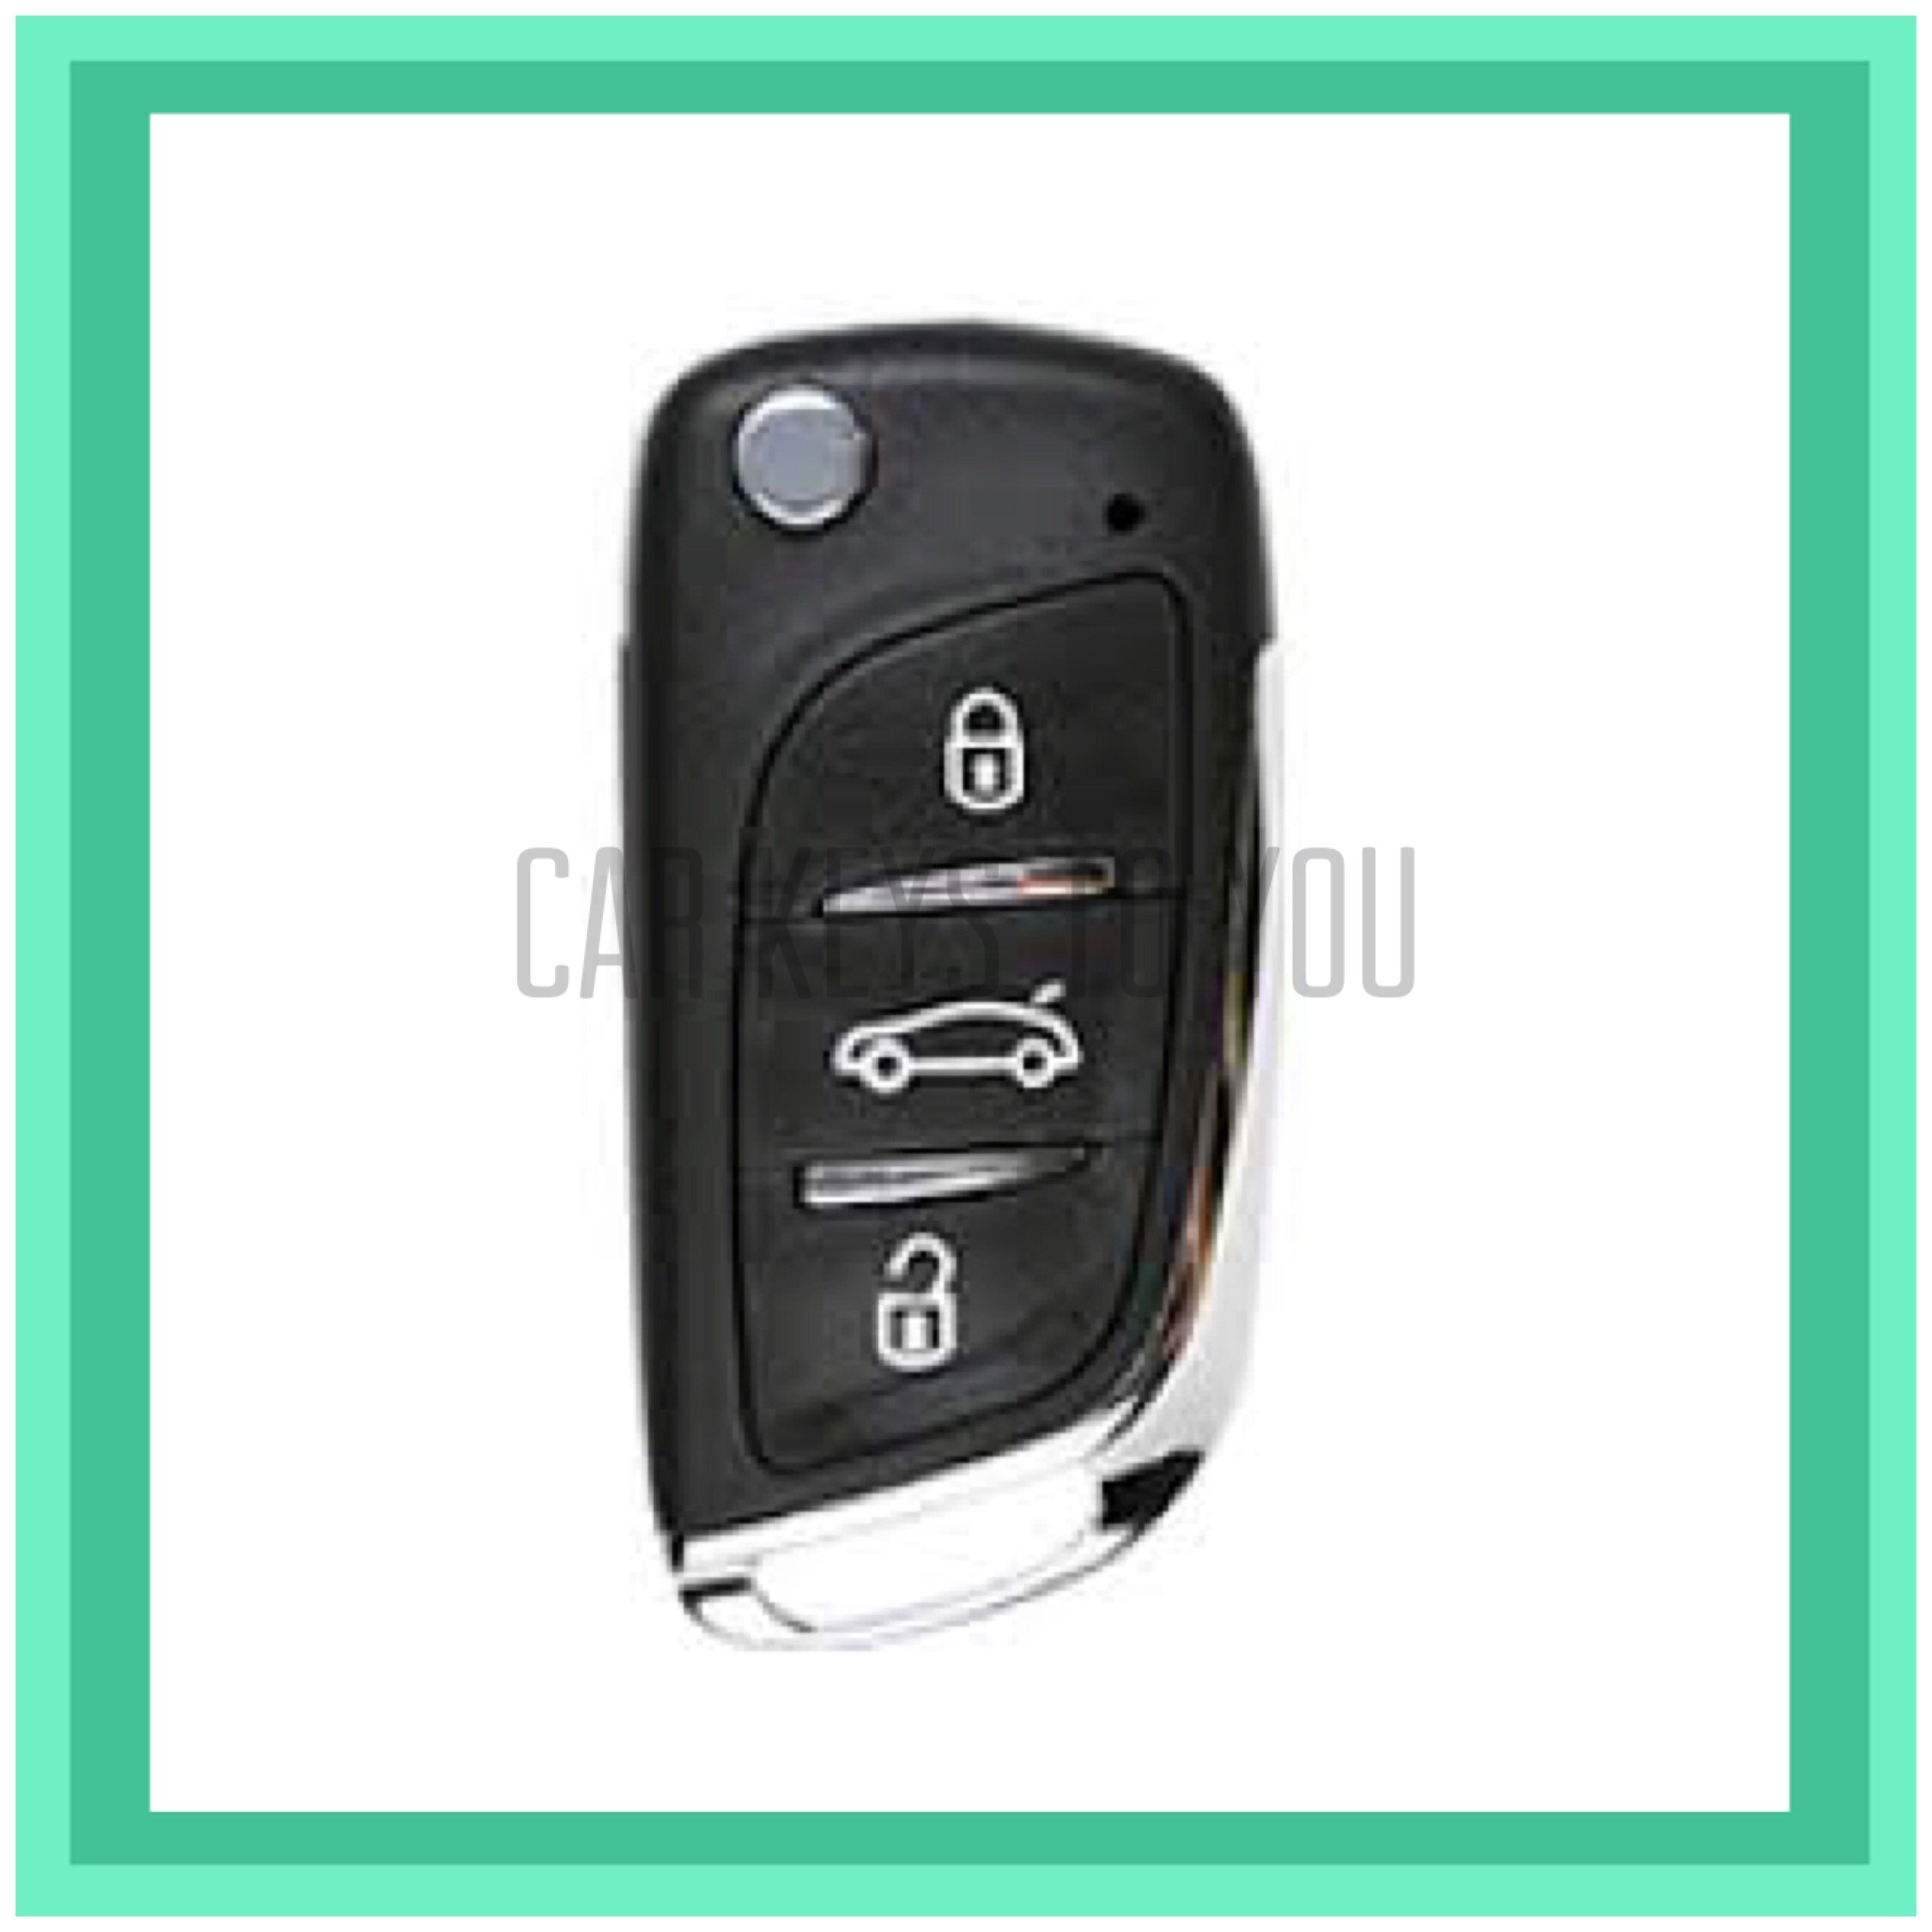 MITSUBISHI LANCER CJ Car Key and Remote, Suit CJ 2007 - 2013